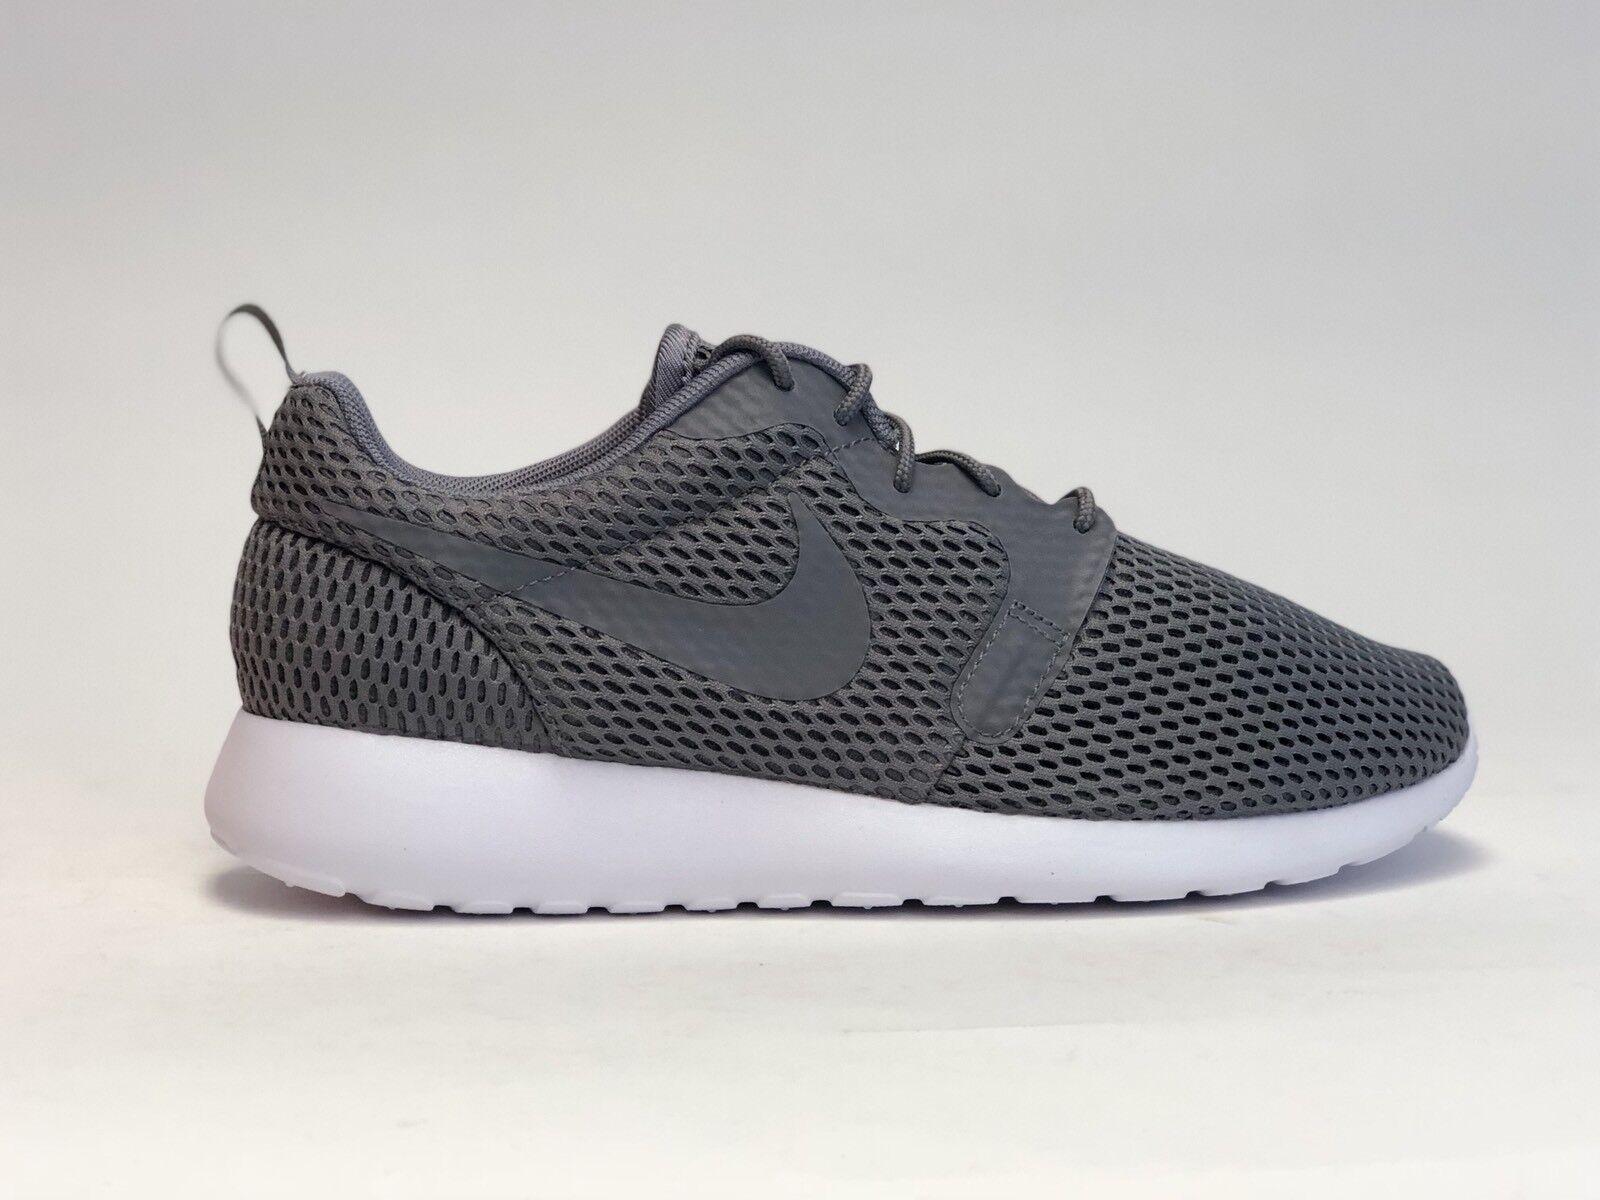 Nike Roshe Run Hyp Br Size 9 NEW